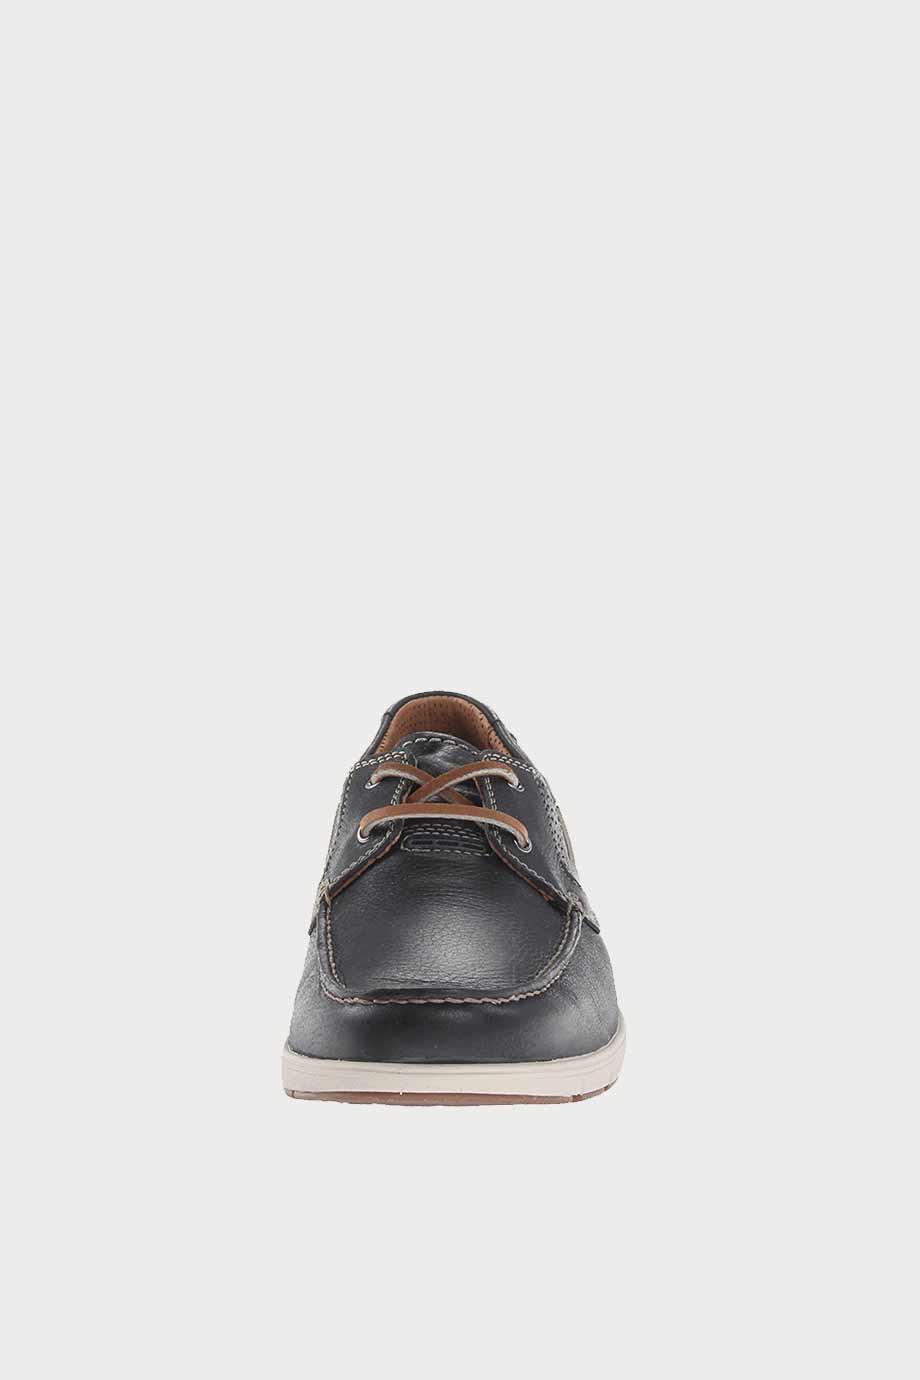 spiridoula metheniti shoes xalkida p Unnautical Sea clarks navy leather 4